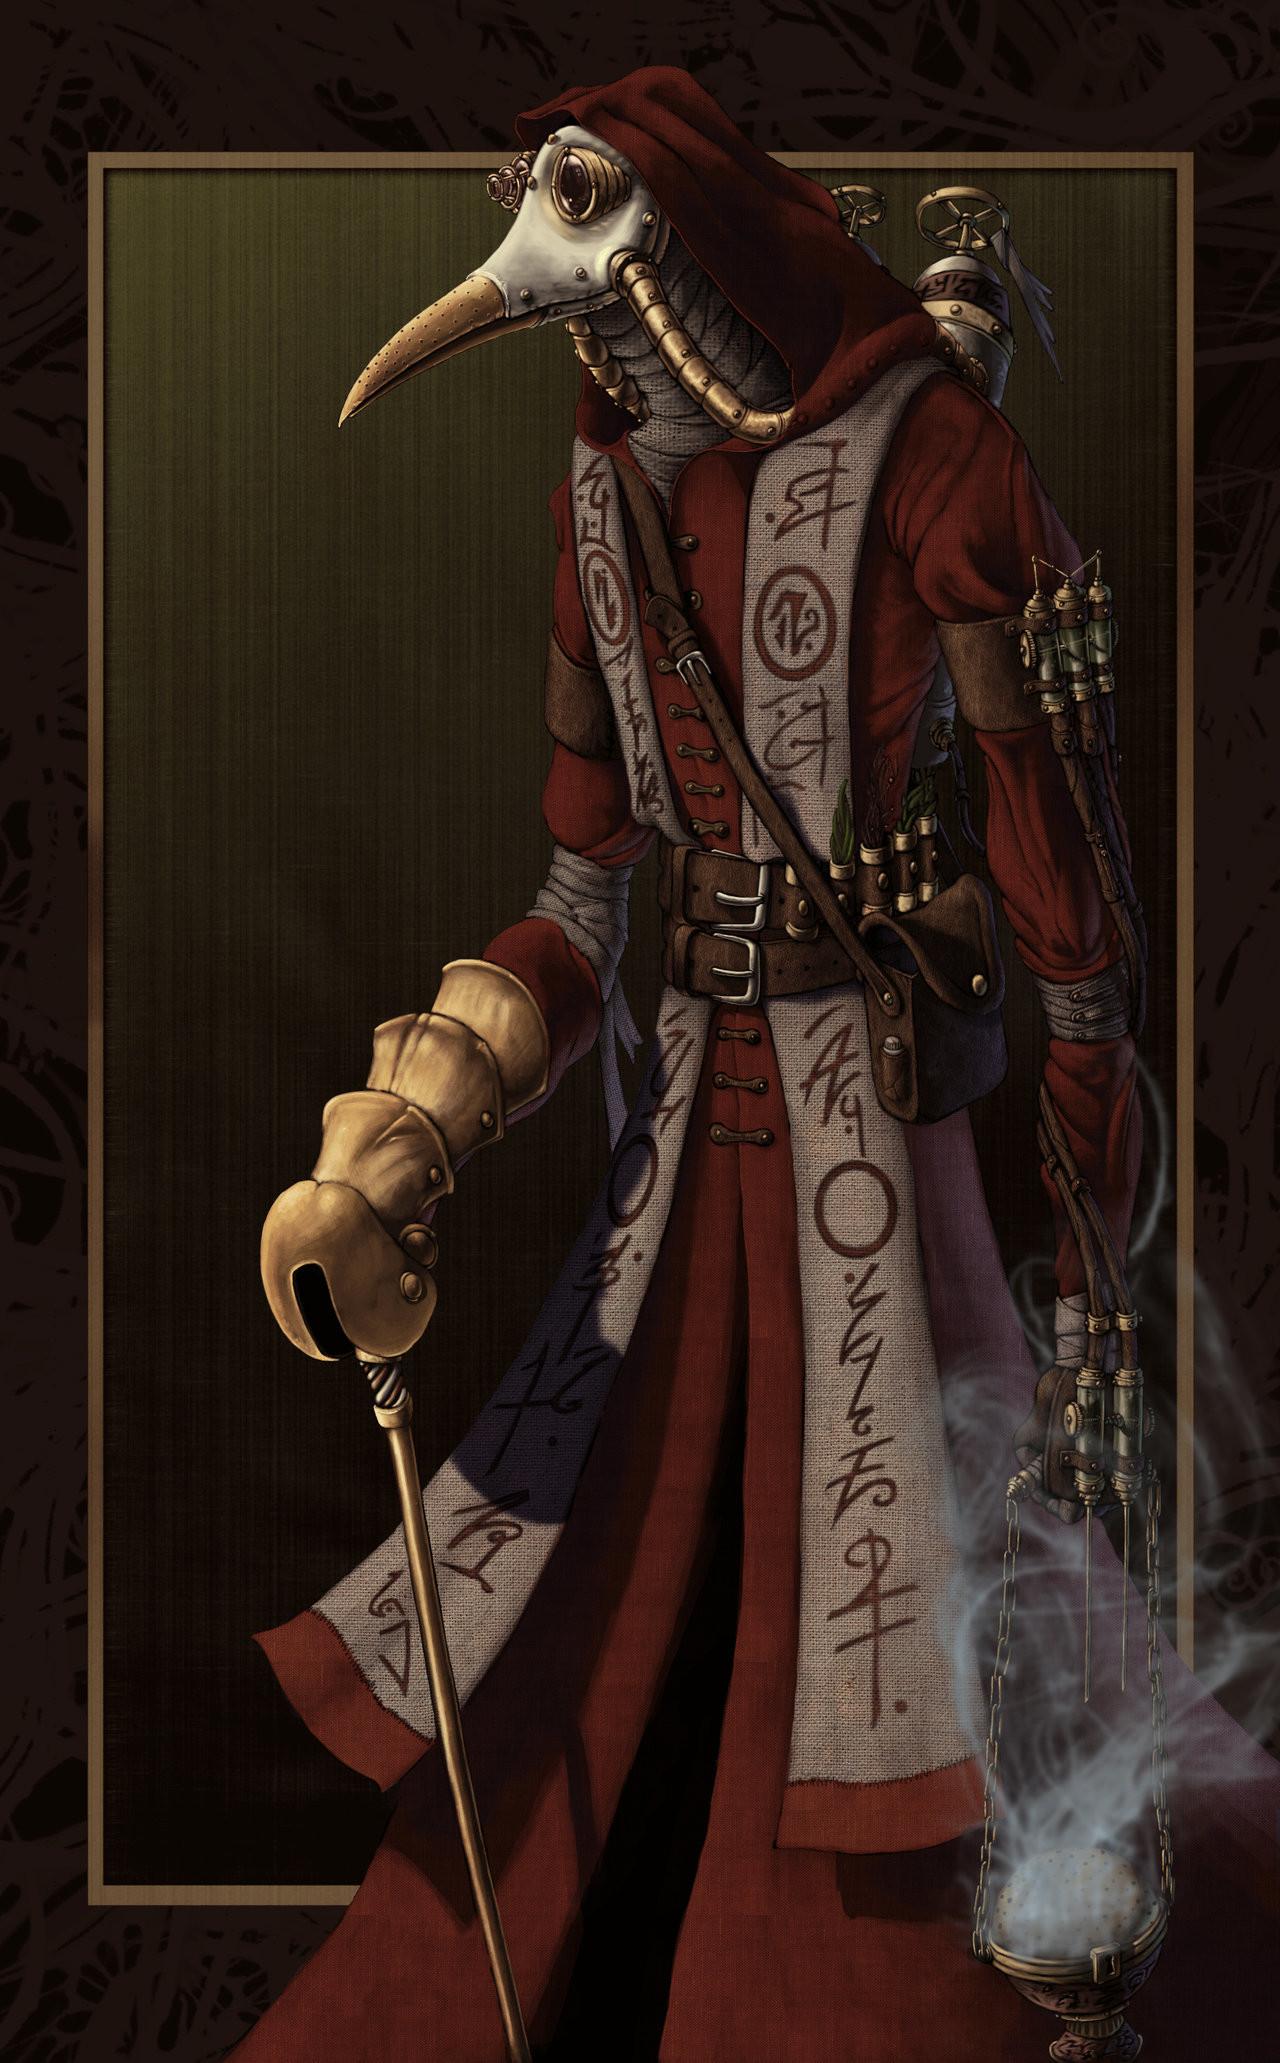 Plague Doctor by Malignanttoast Plague Doctor by Malignanttoast